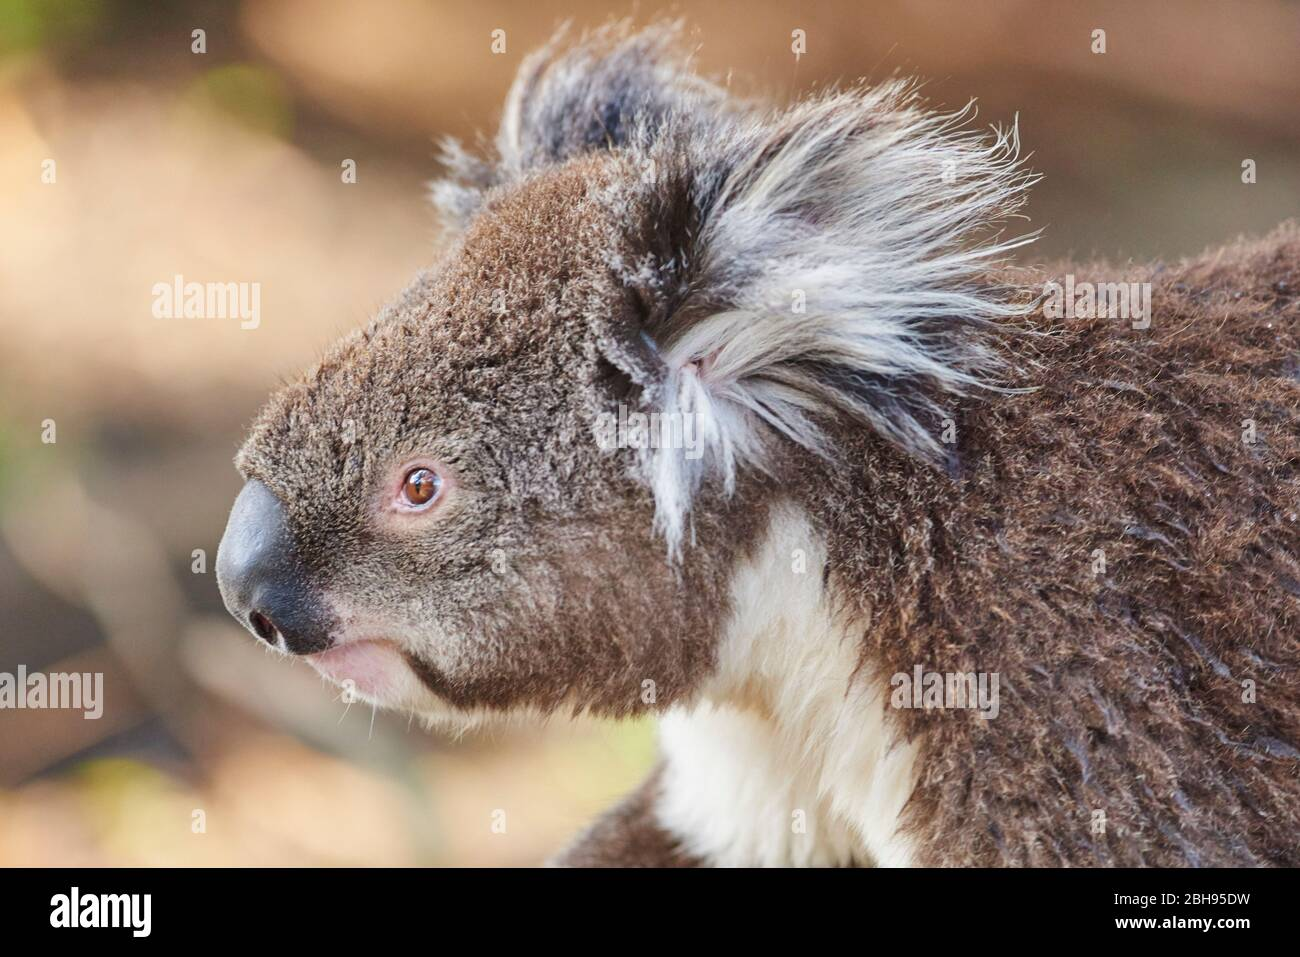 Koala (Phascolarctos cinereus), portrait, lateral Stock Photo